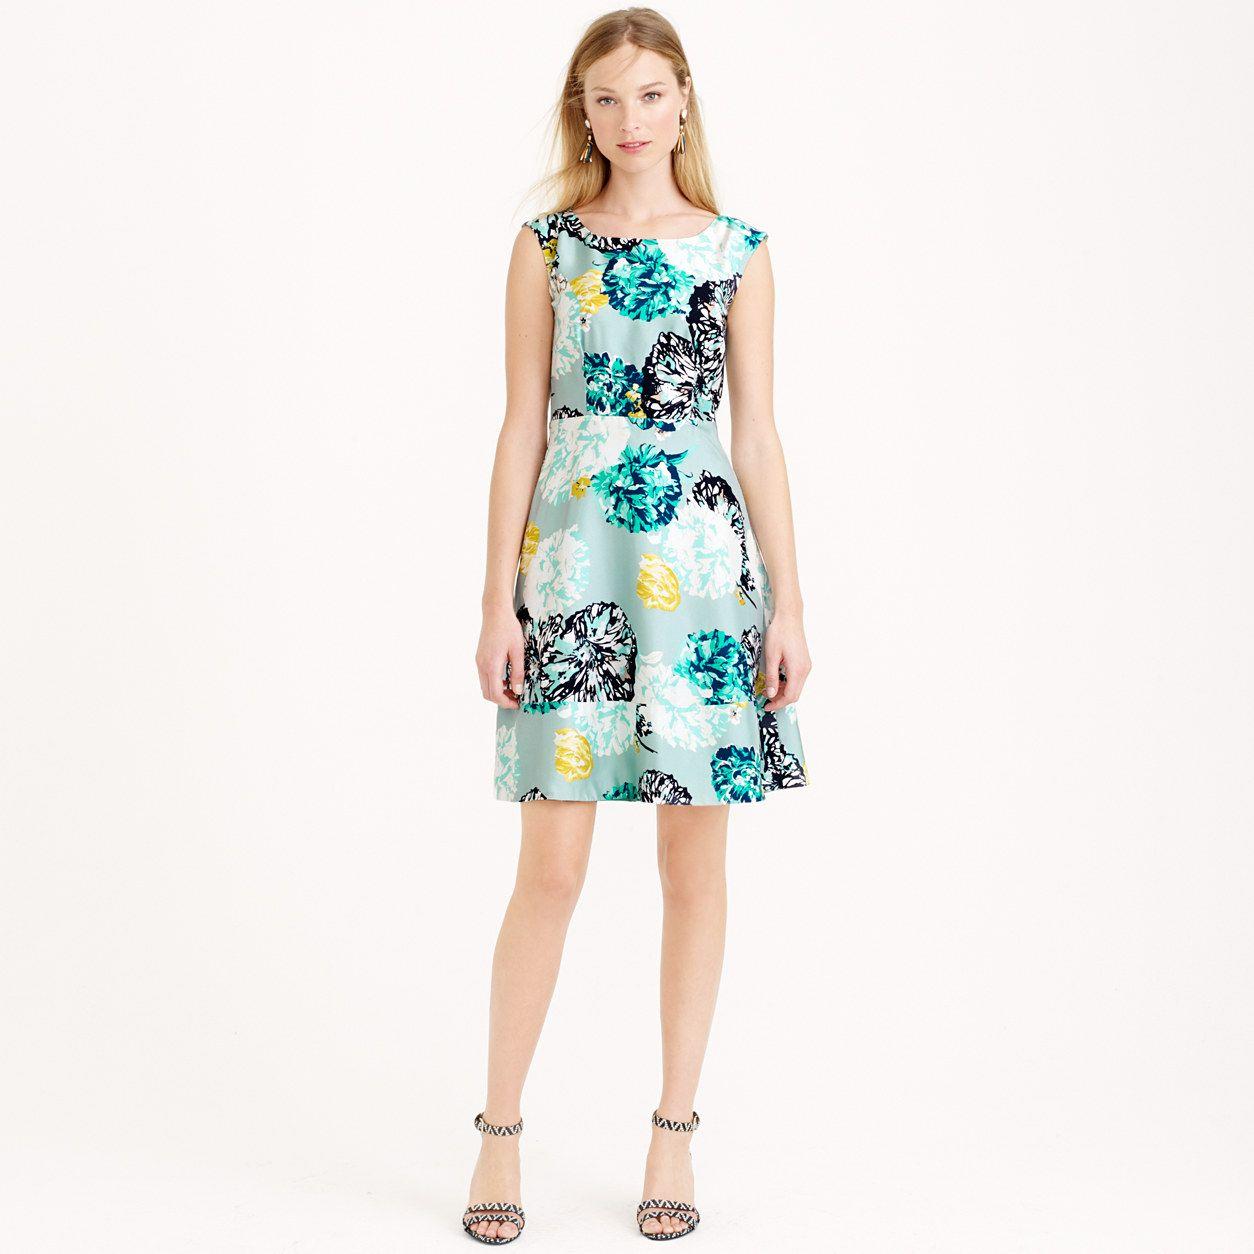 Aquatic floral silk dress day jew sewing inspiration aquatic floral silk dress day jew ombrellifo Gallery